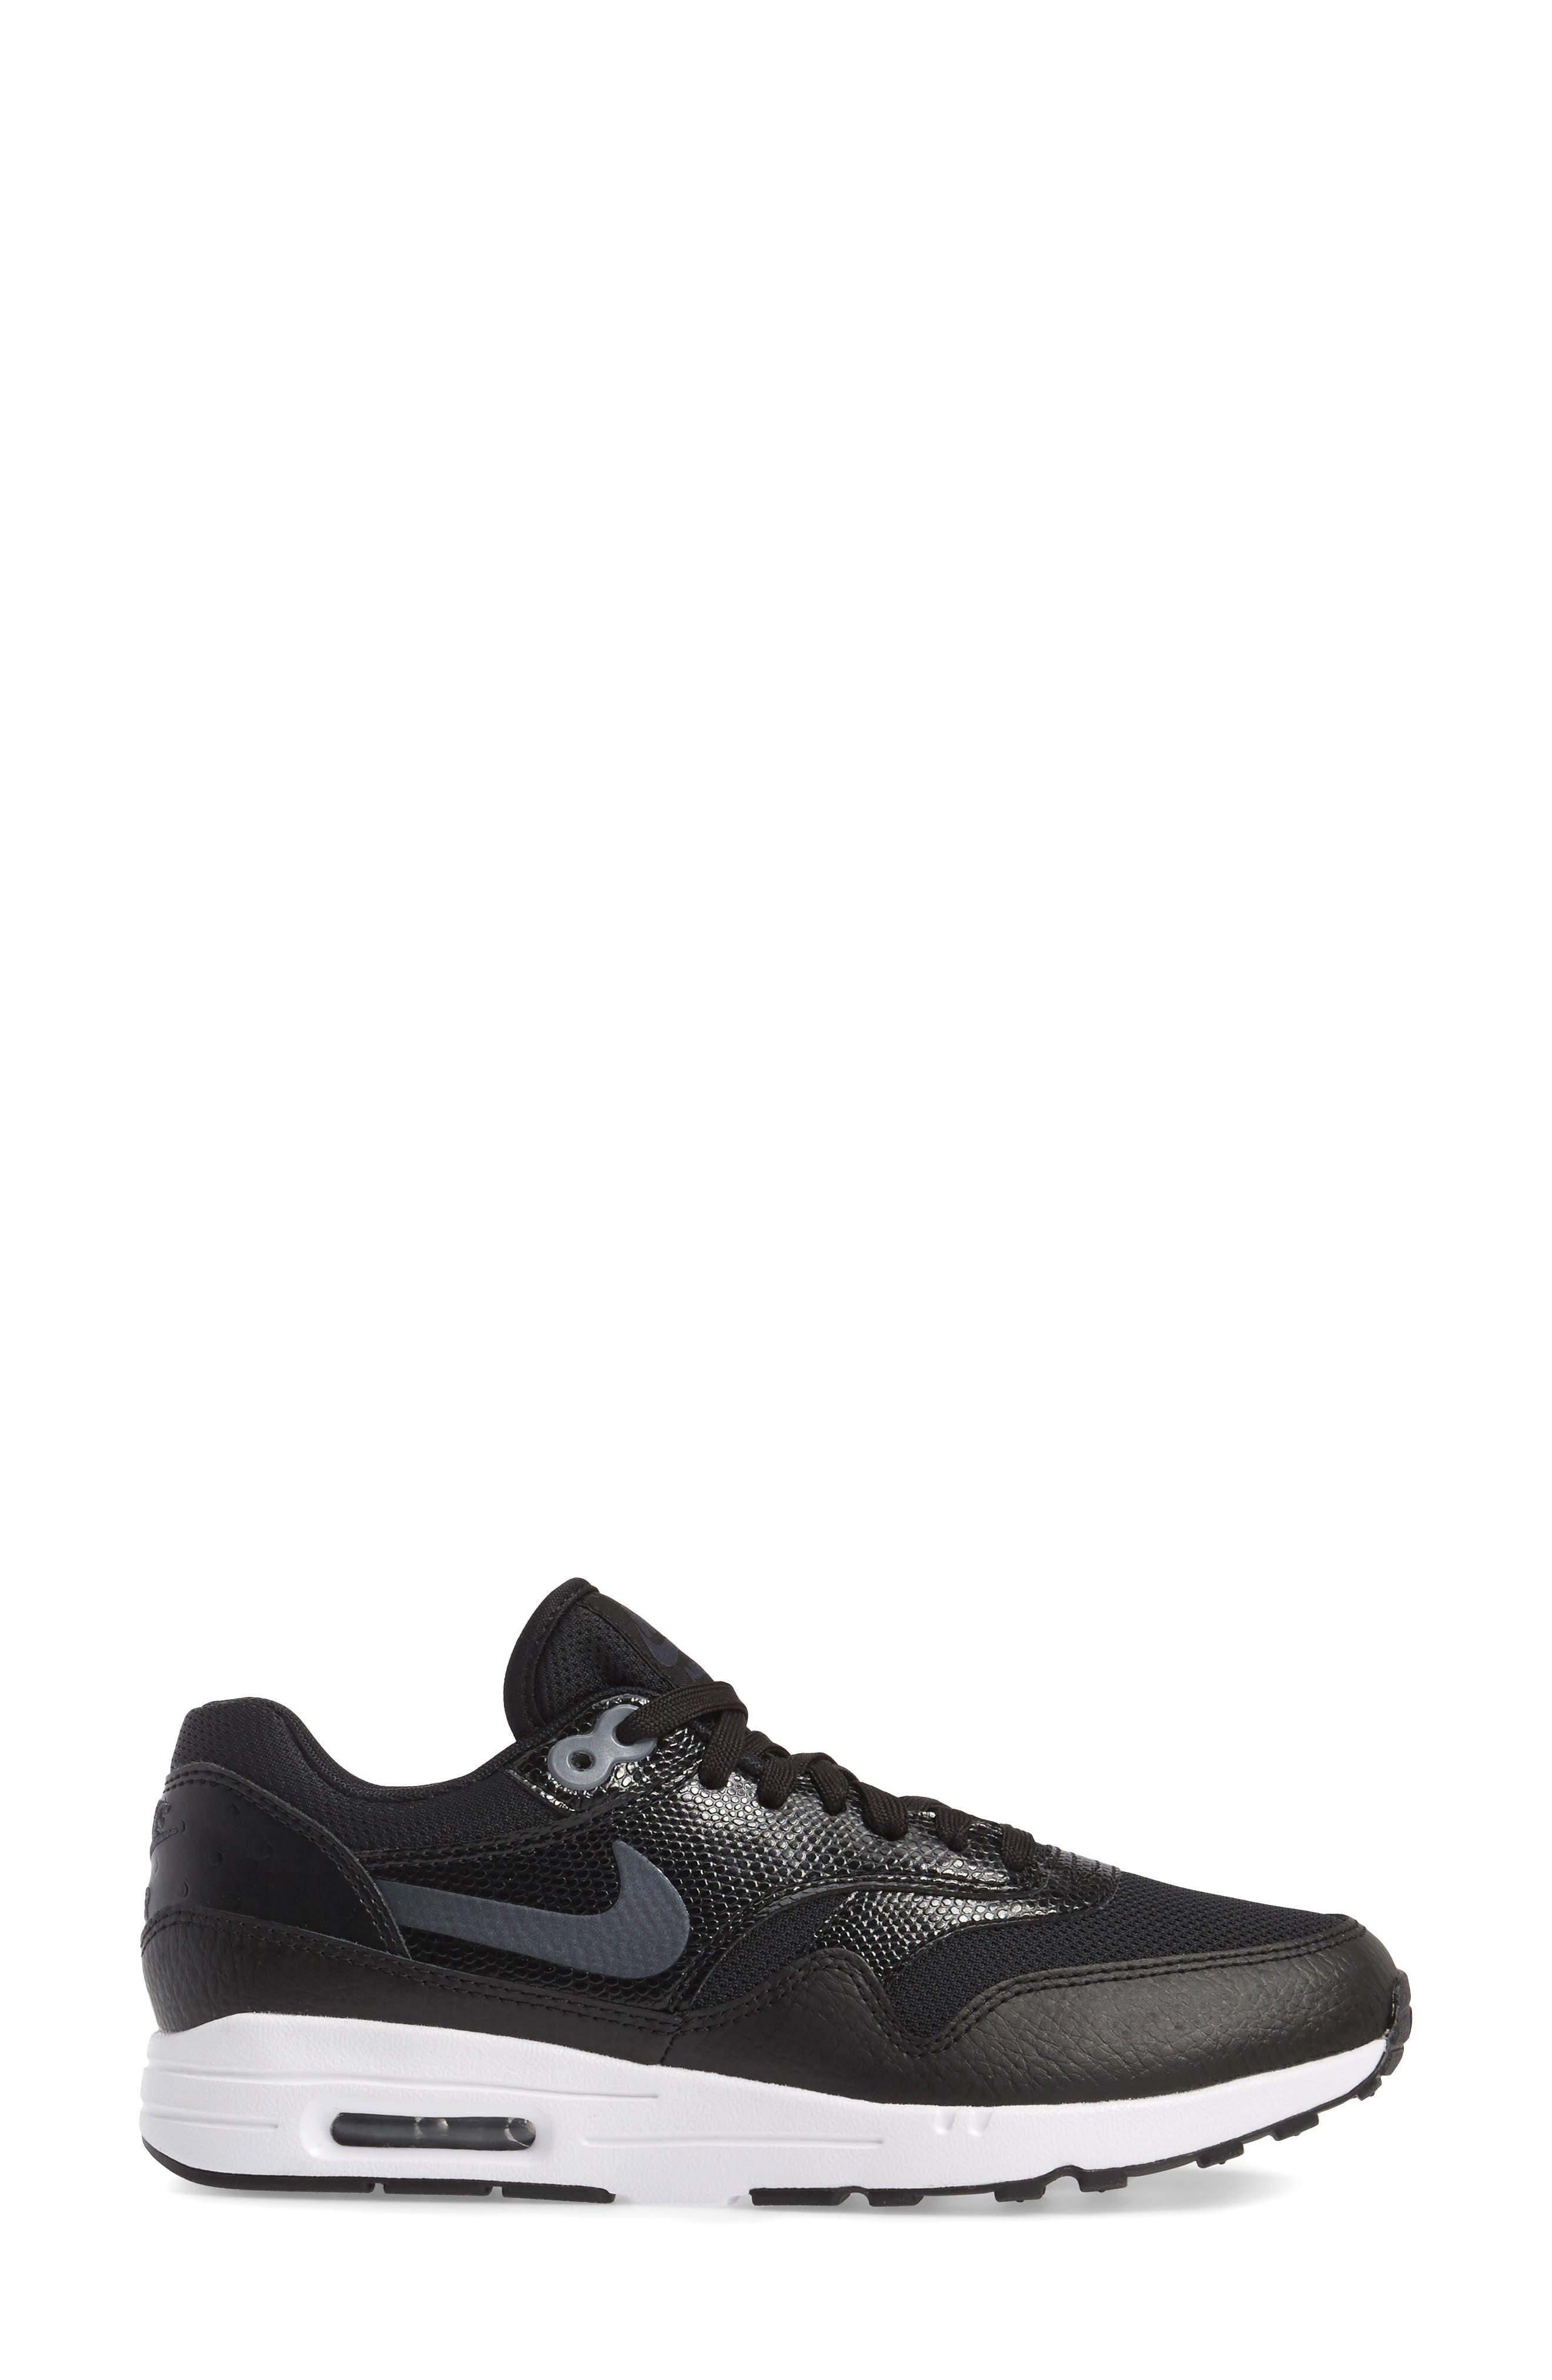 Air Max 1 Ultra 2.0 Running Shoe,                             Alternate thumbnail 3, color,                             Hematite/ Black/ White